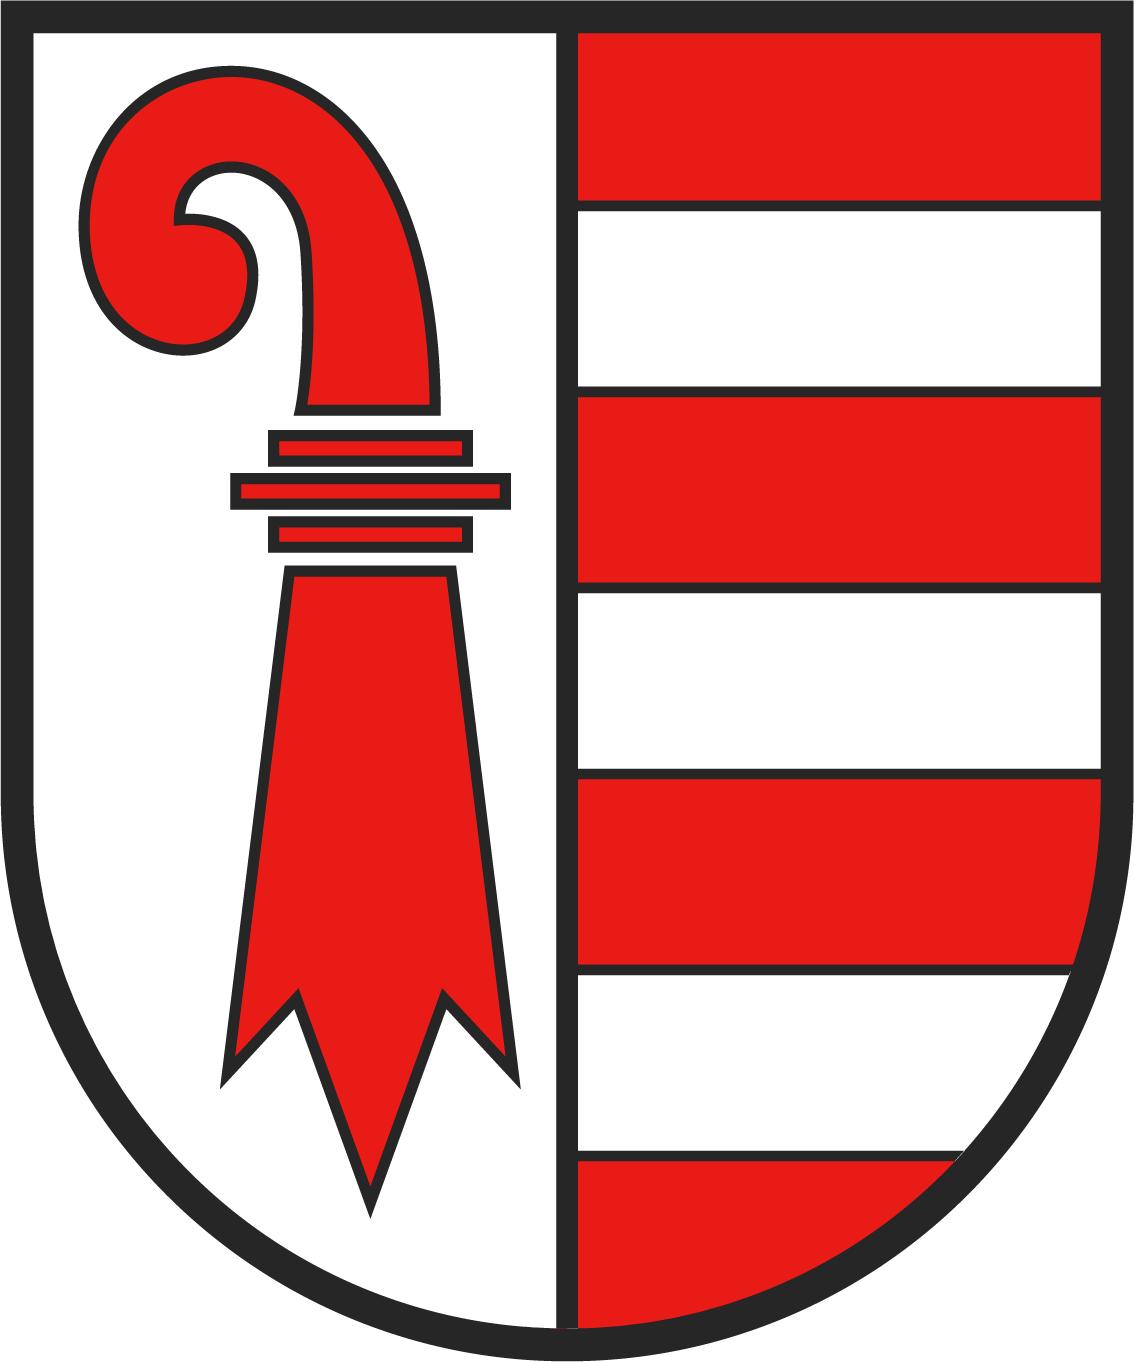 Wappen des Kantons Jura